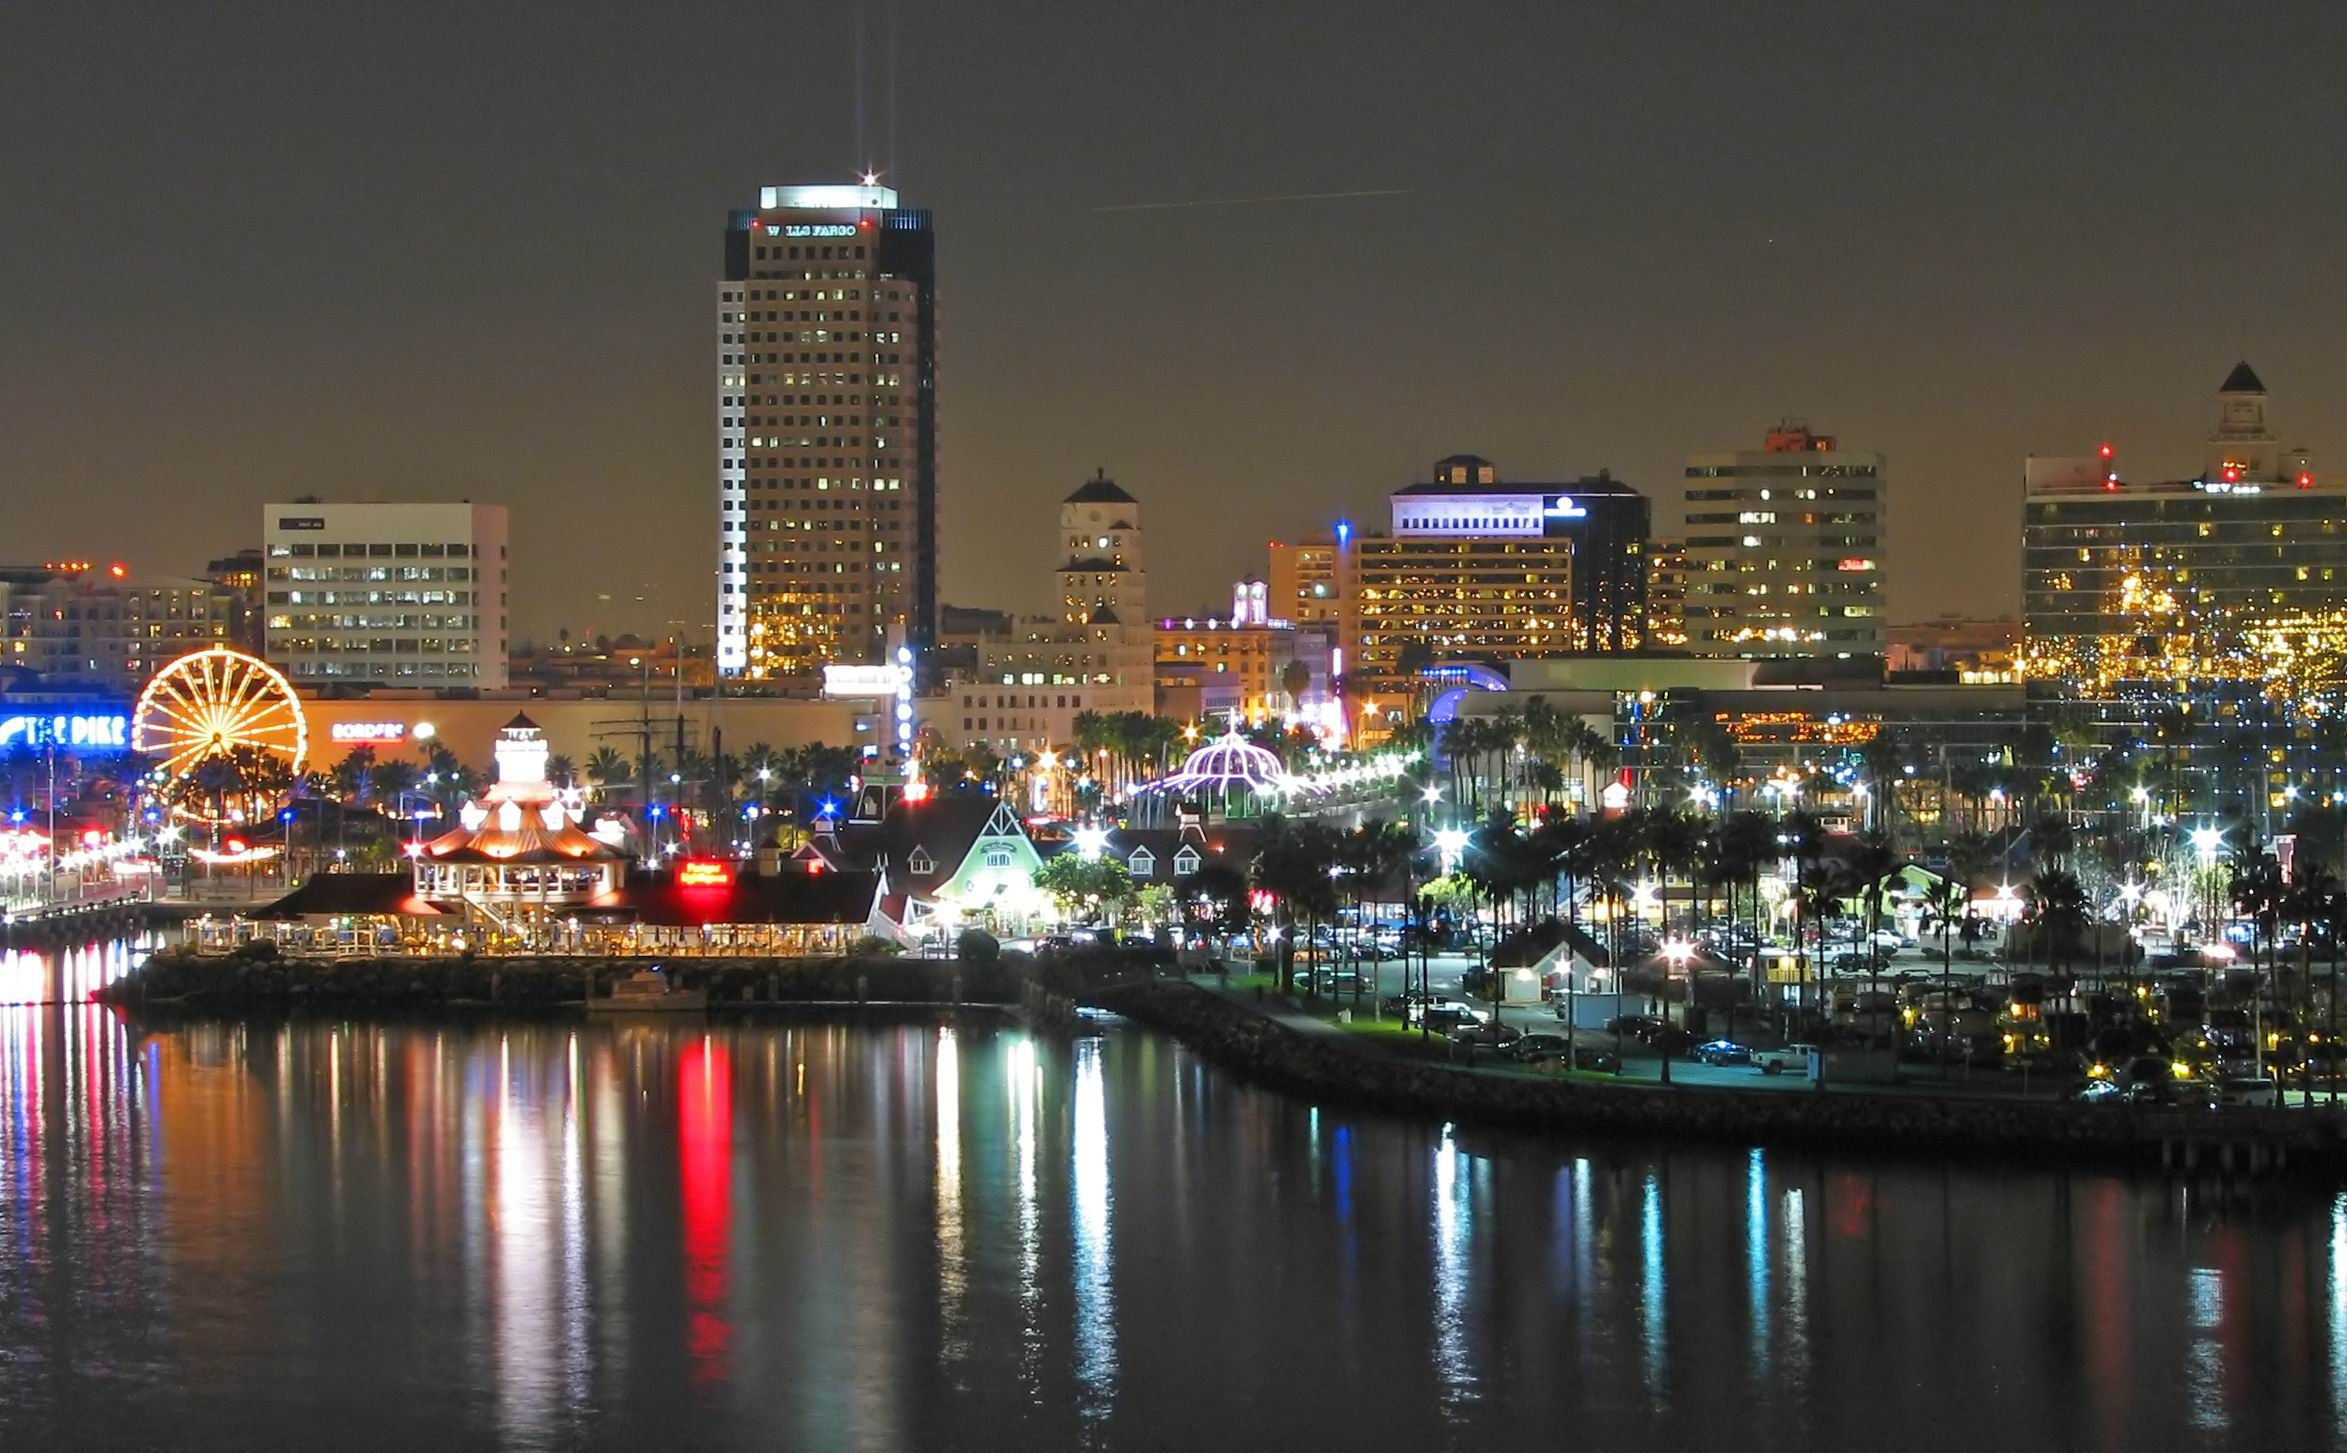 long beach california | Long Beach at night, California Desktop Wallpapers and Backgrounds